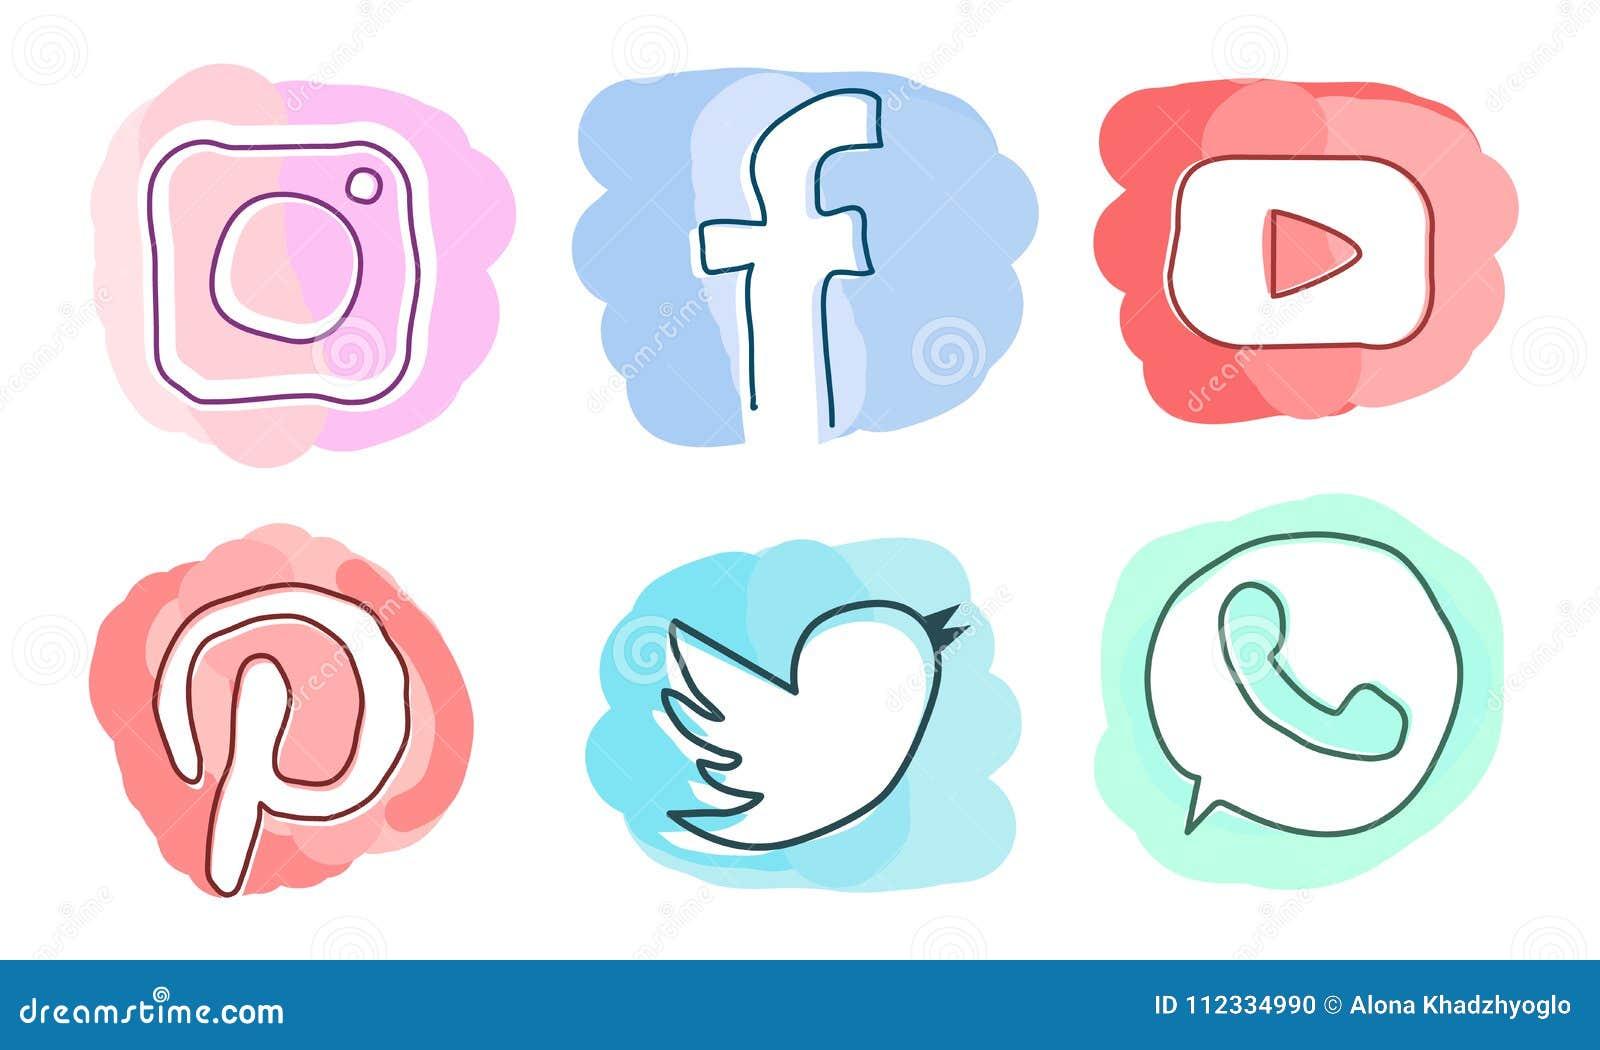 4507b39a1432553457 Fb Xl Png: Set Of Social Media Icons: Instagram, Facebook, Pinterest